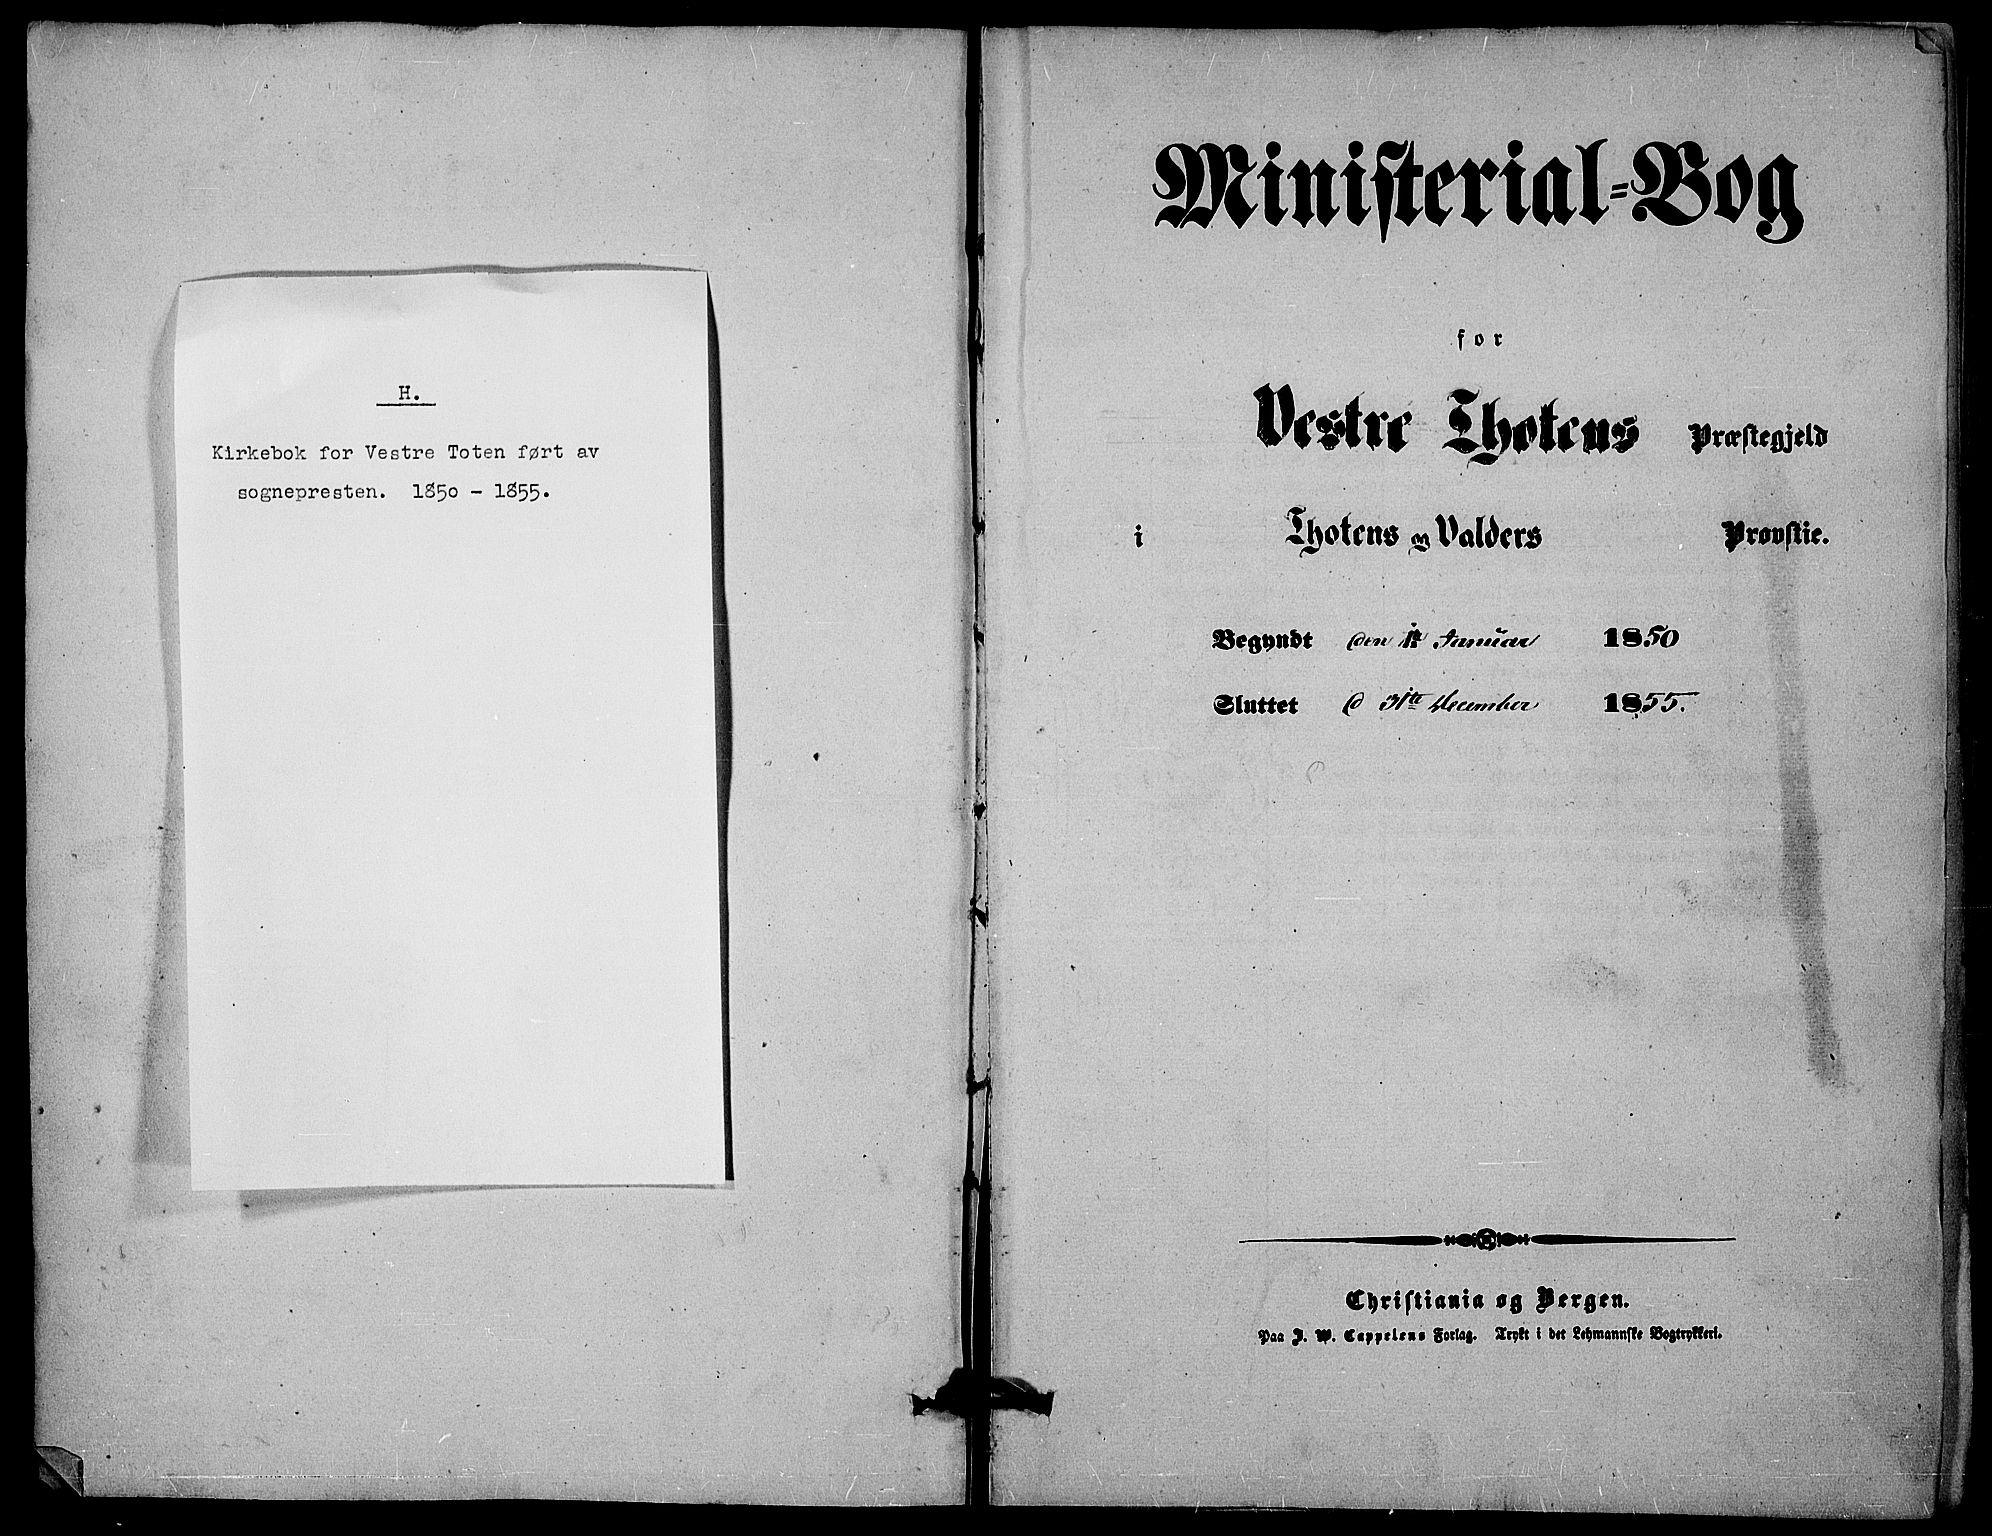 SAH, Vestre Toten prestekontor, H/Ha/Haa/L0005: Ministerialbok nr. 5, 1850-1855